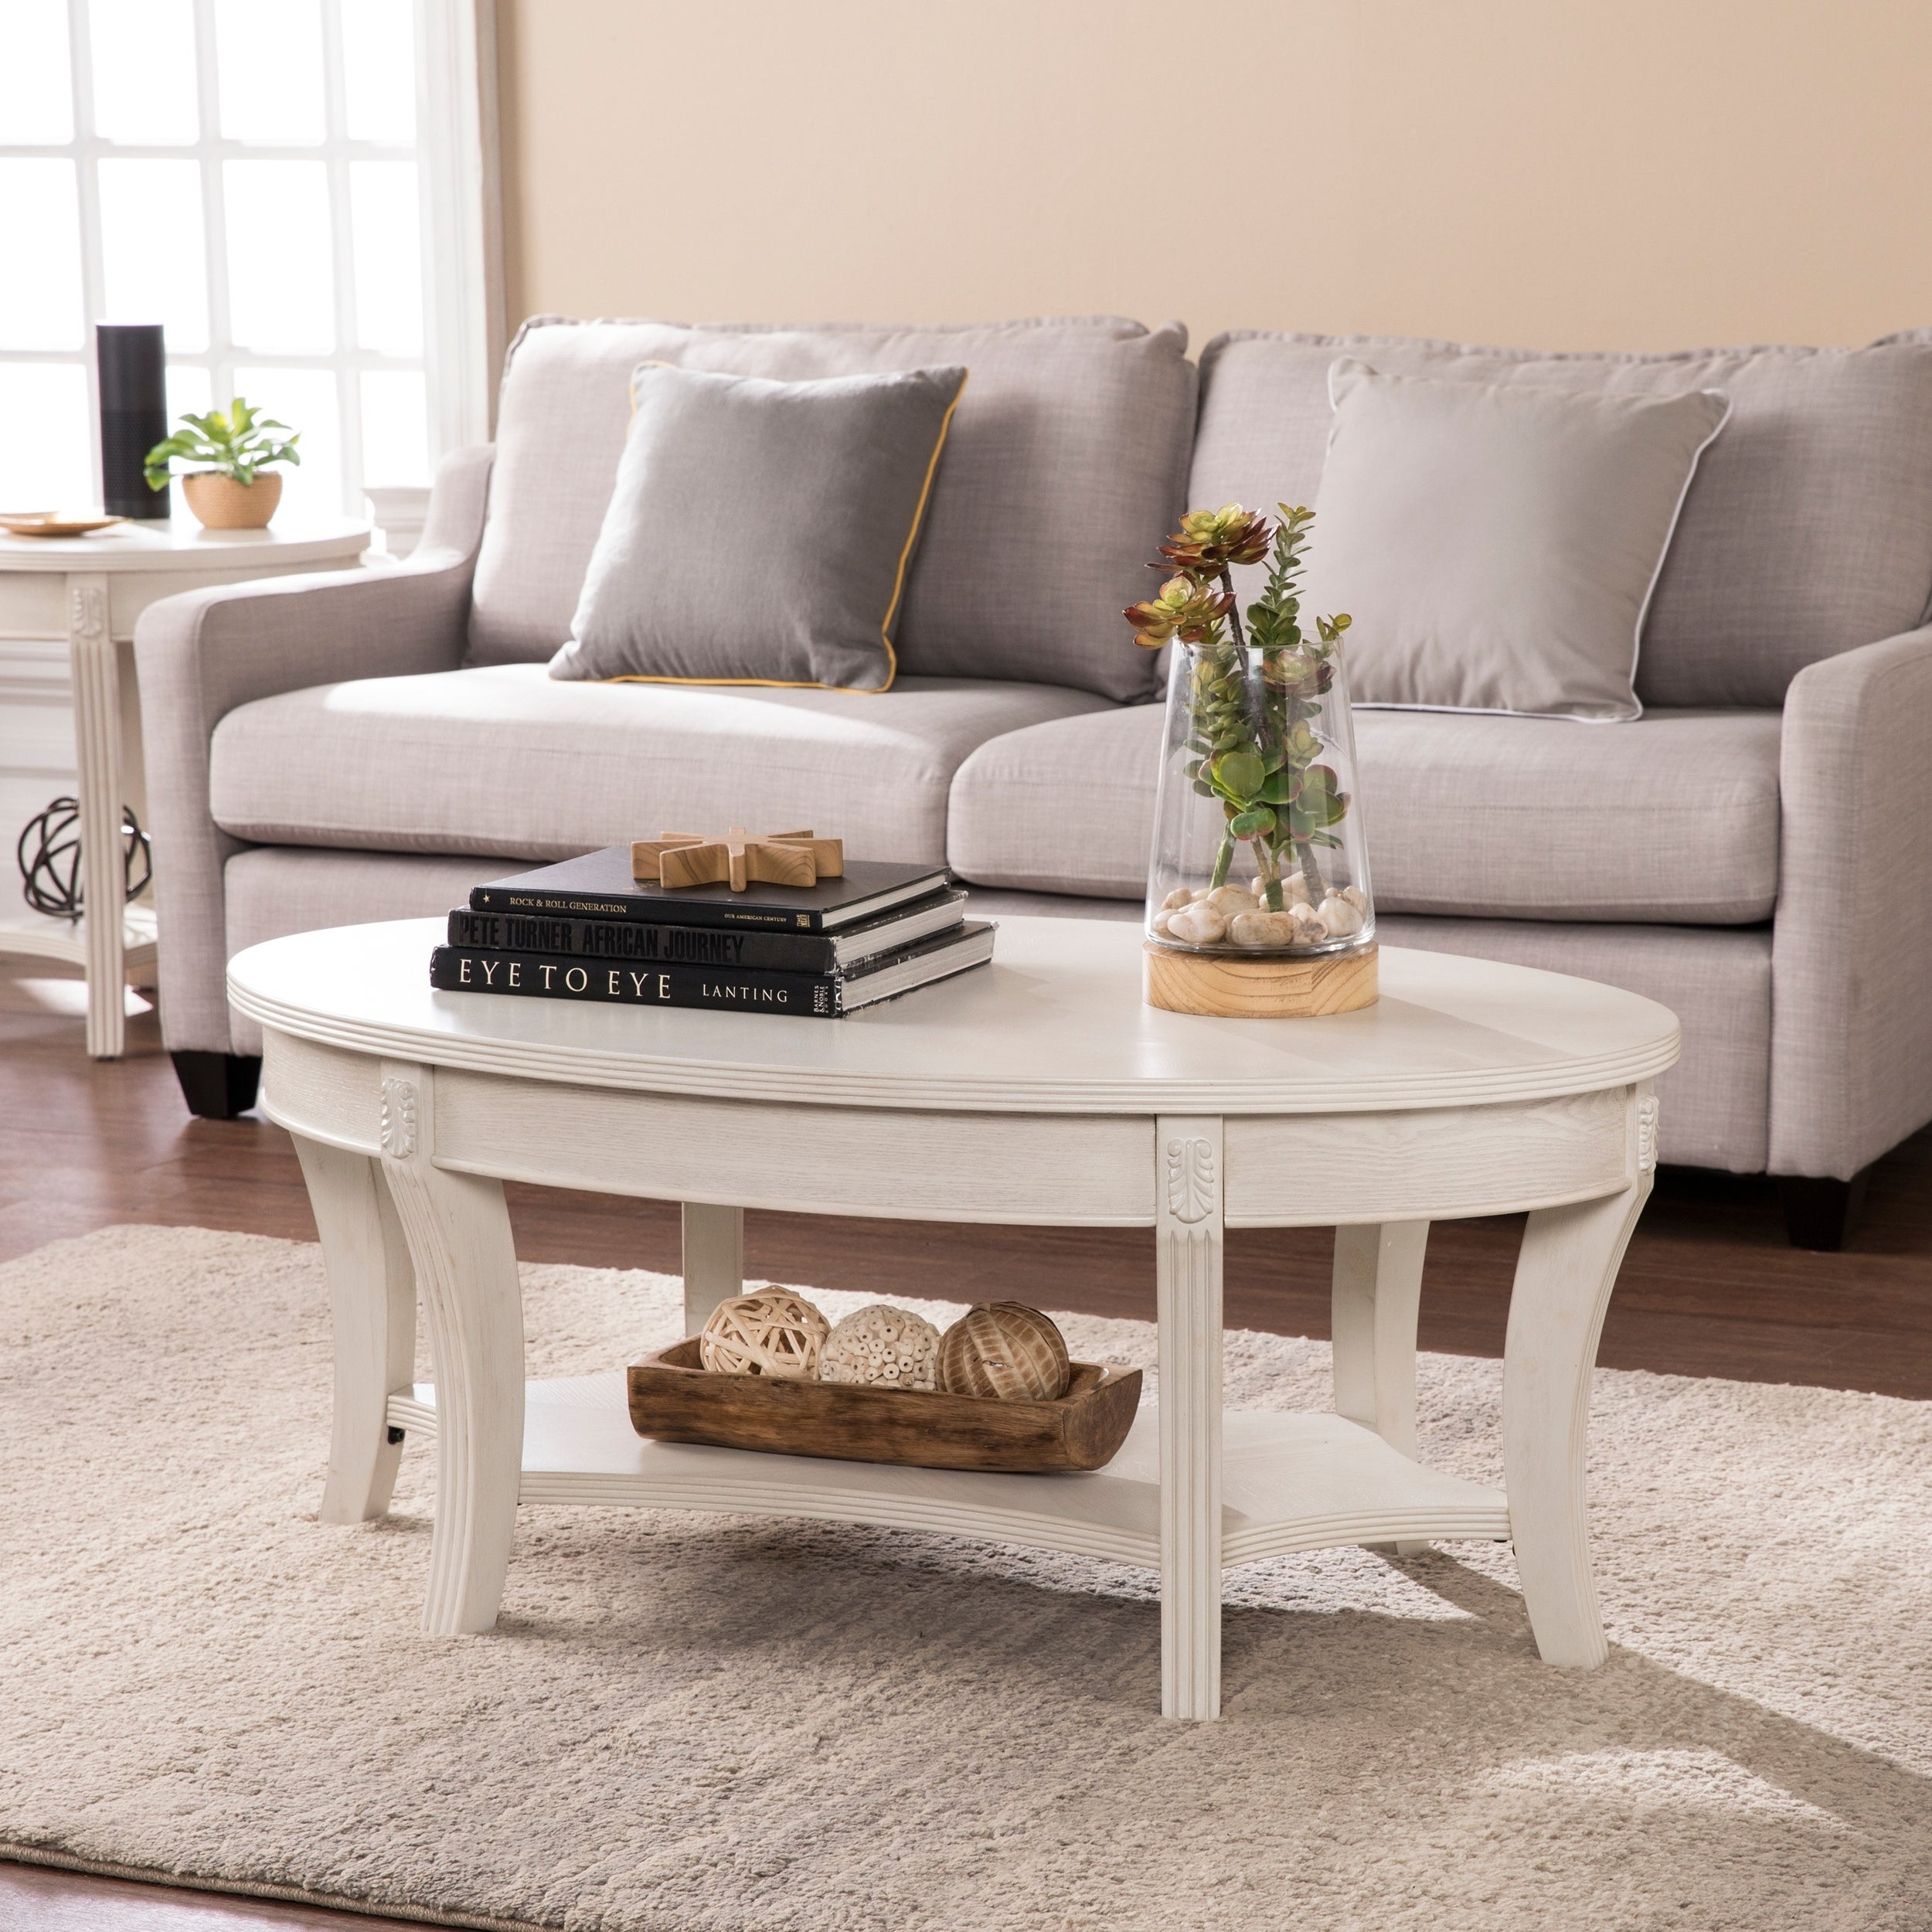 Harper Blvd Marlton Traditional Demilune Whitewash Console Table